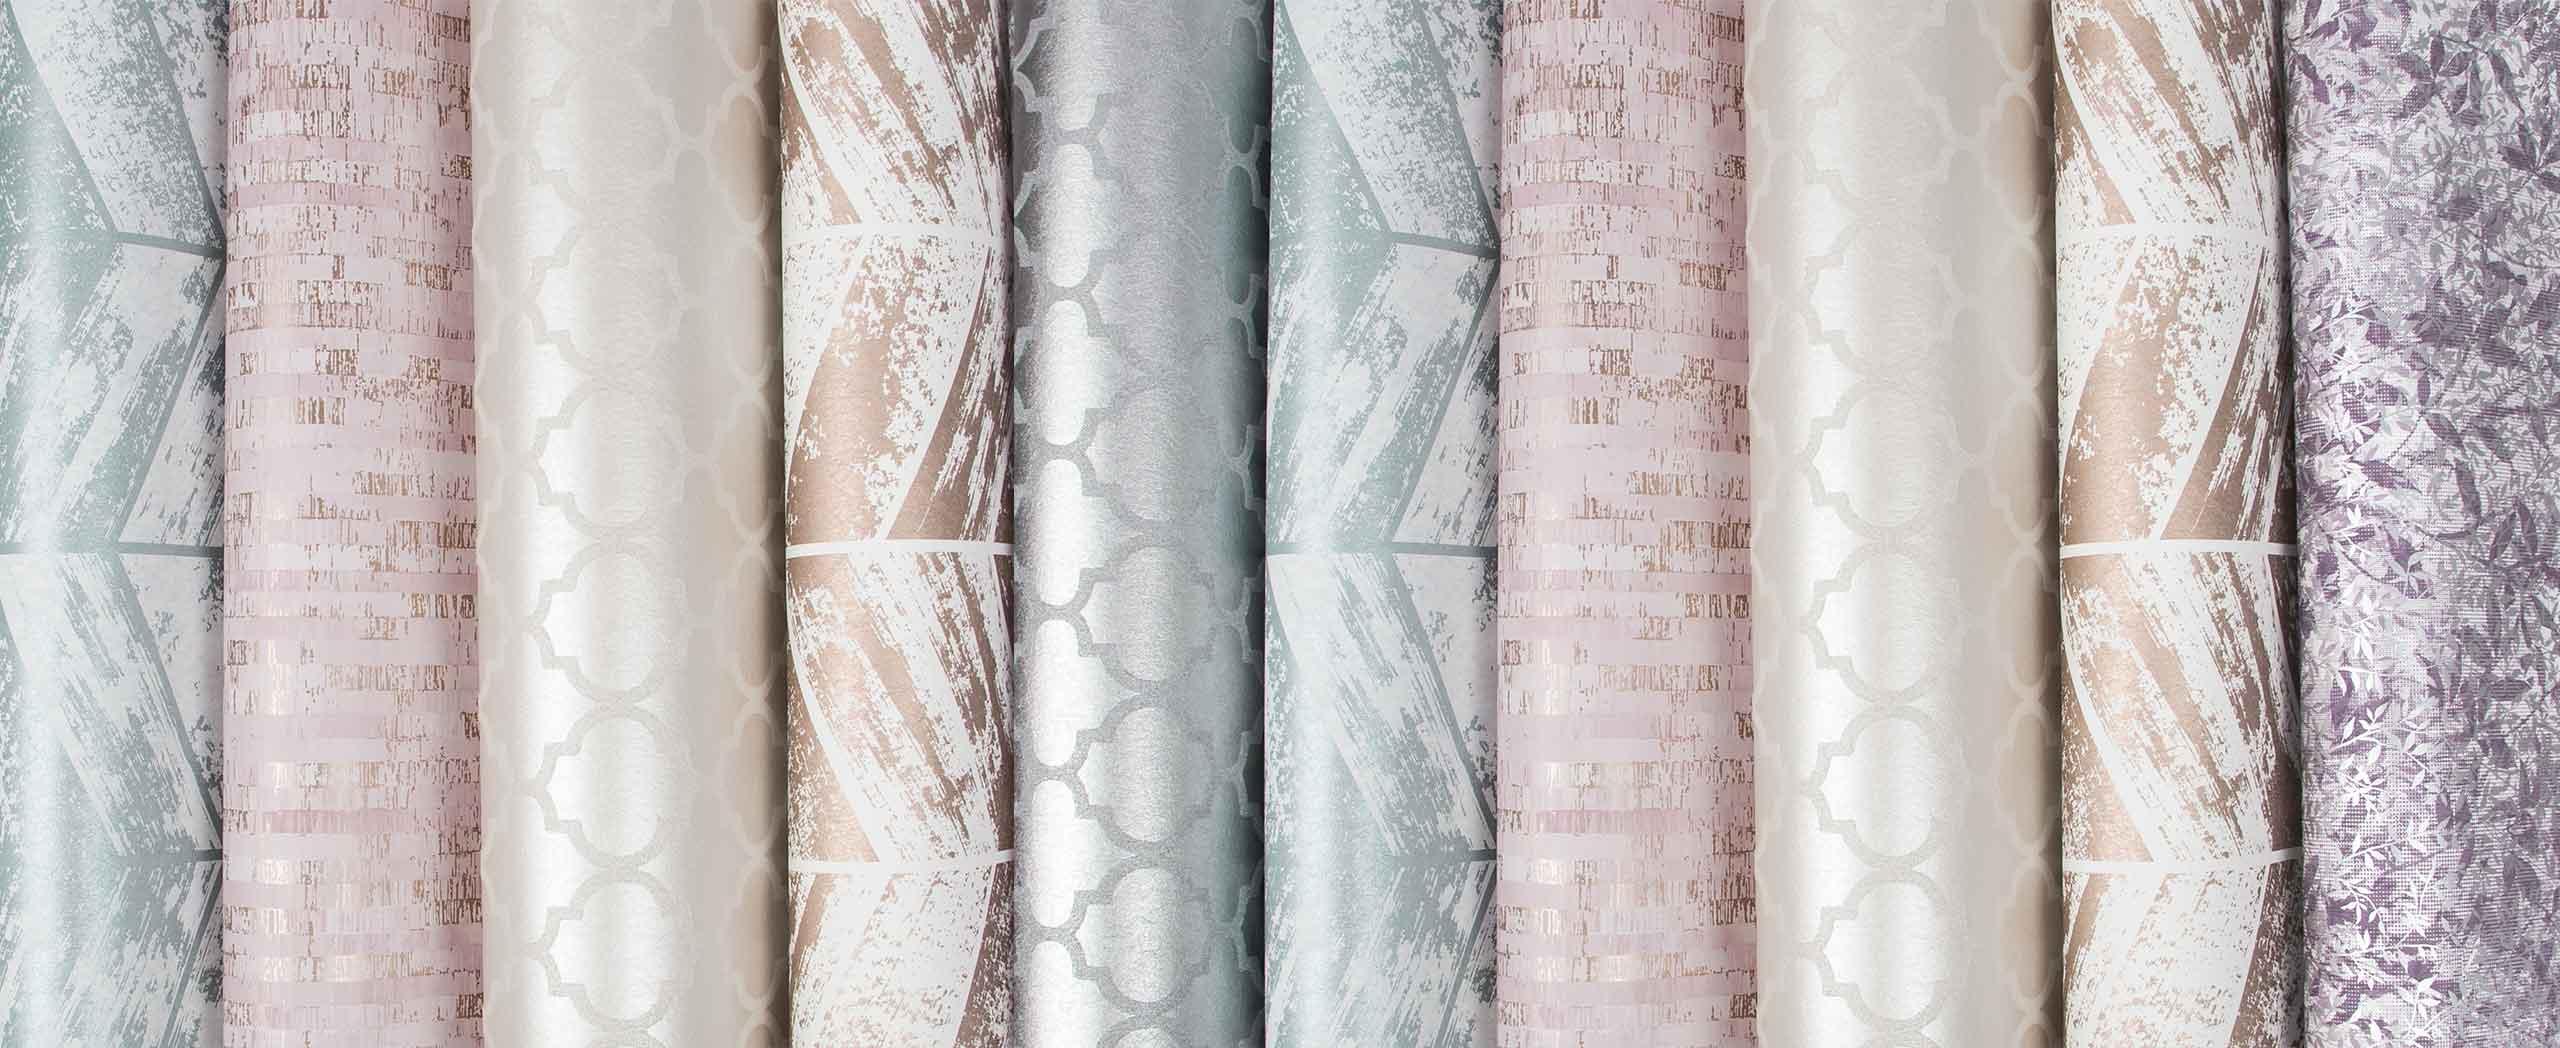 Wallpaper Blog Interior Design Blog Home Decor Blogs 2560x1048